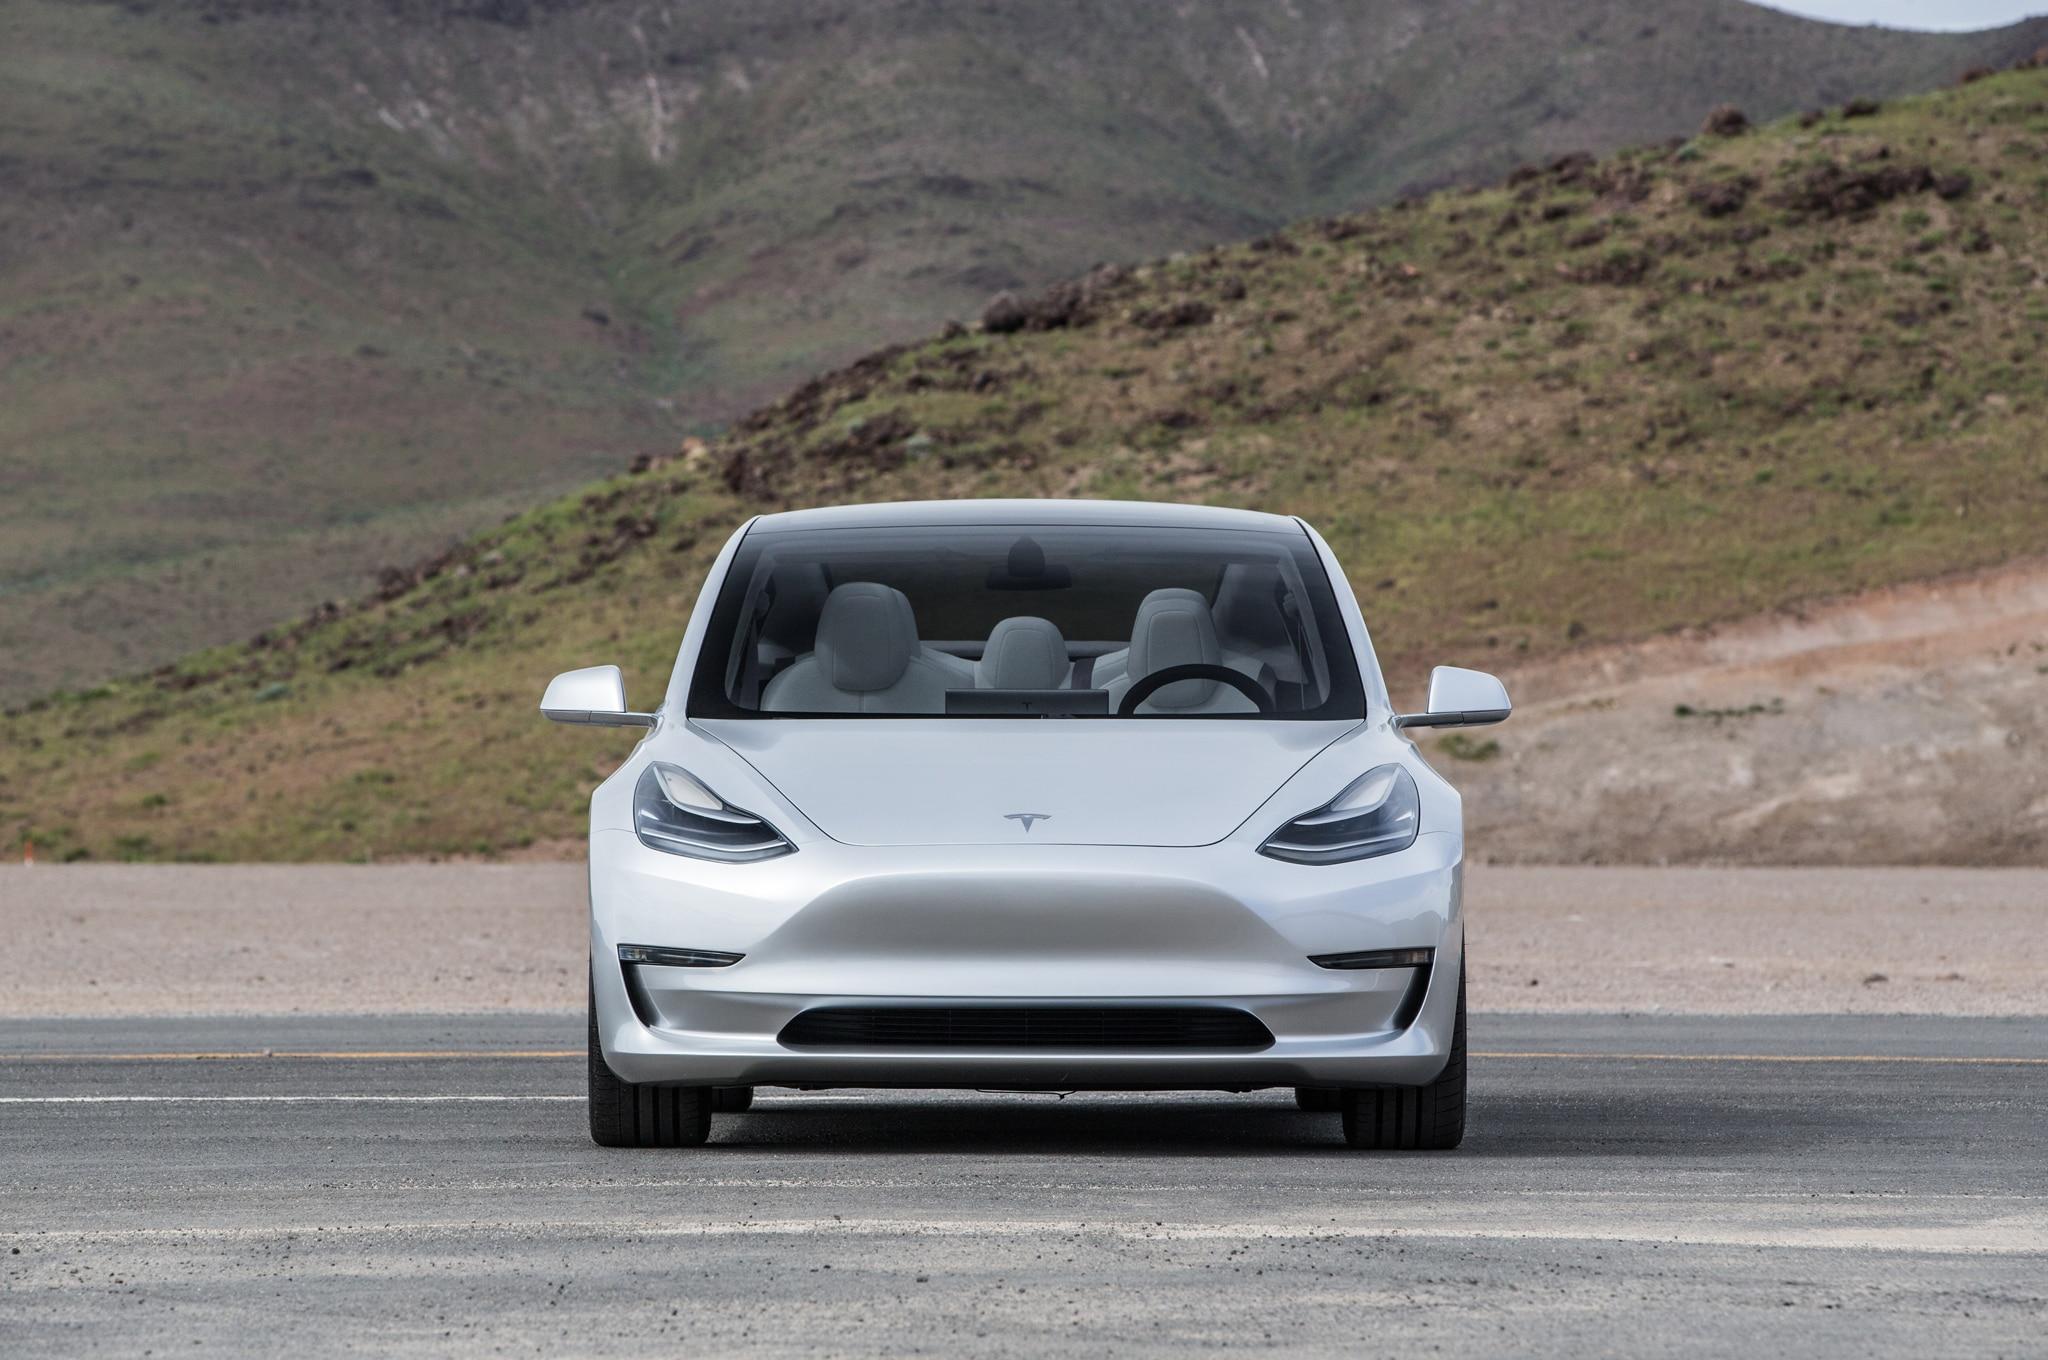 2017 Tesla Model 3 Front End 29 Junio 2016 Wpengine